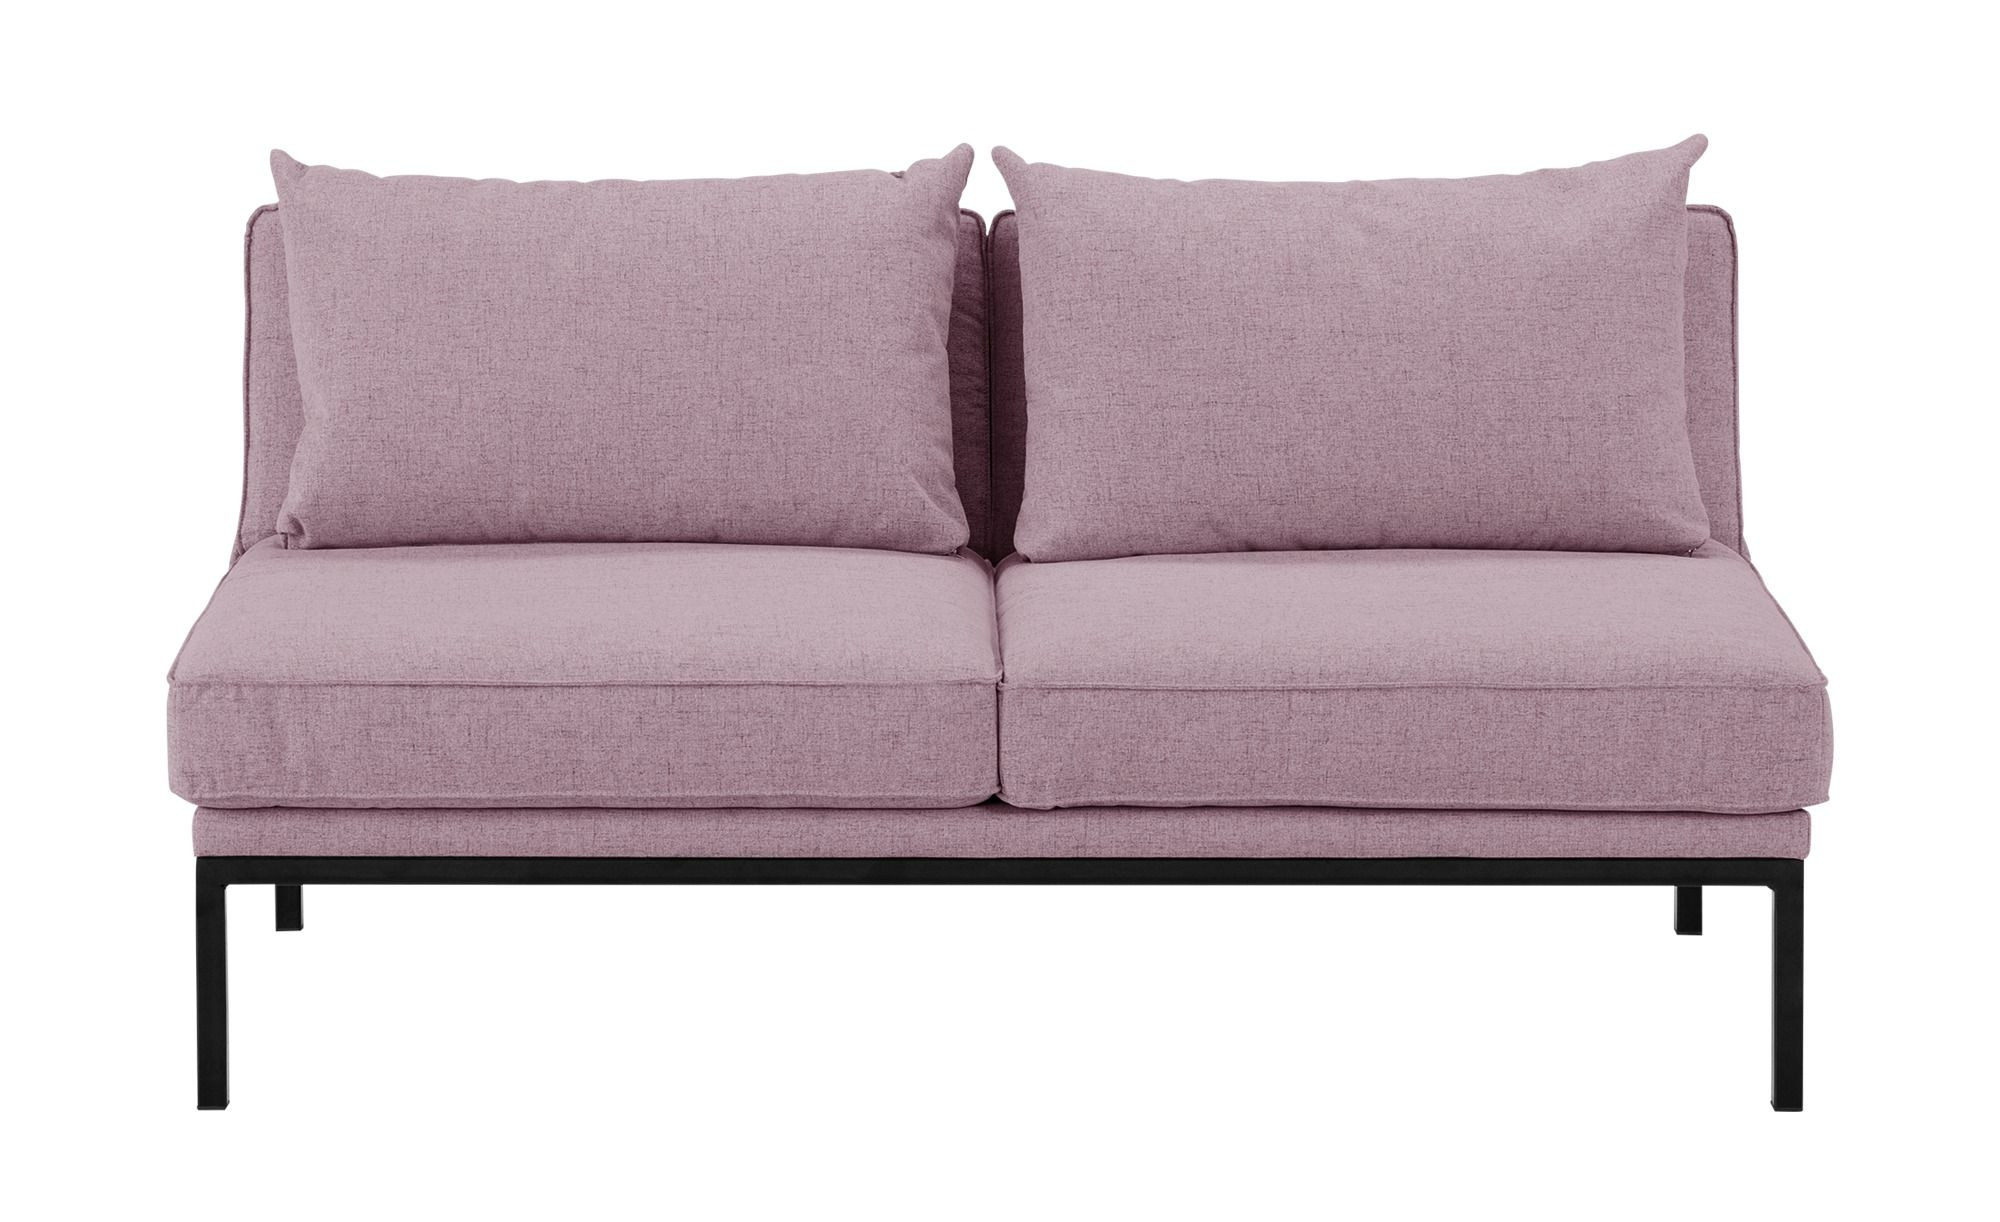 Smart Sofa 2 Sitzig Laura Rosa Pink Masse Cm B 160 H 45 T 80 Polstermobel Sofas 2 Sitzer Hoffner Jetzt Bestell Sofa Big Sofa Kaufen Sofa Leder